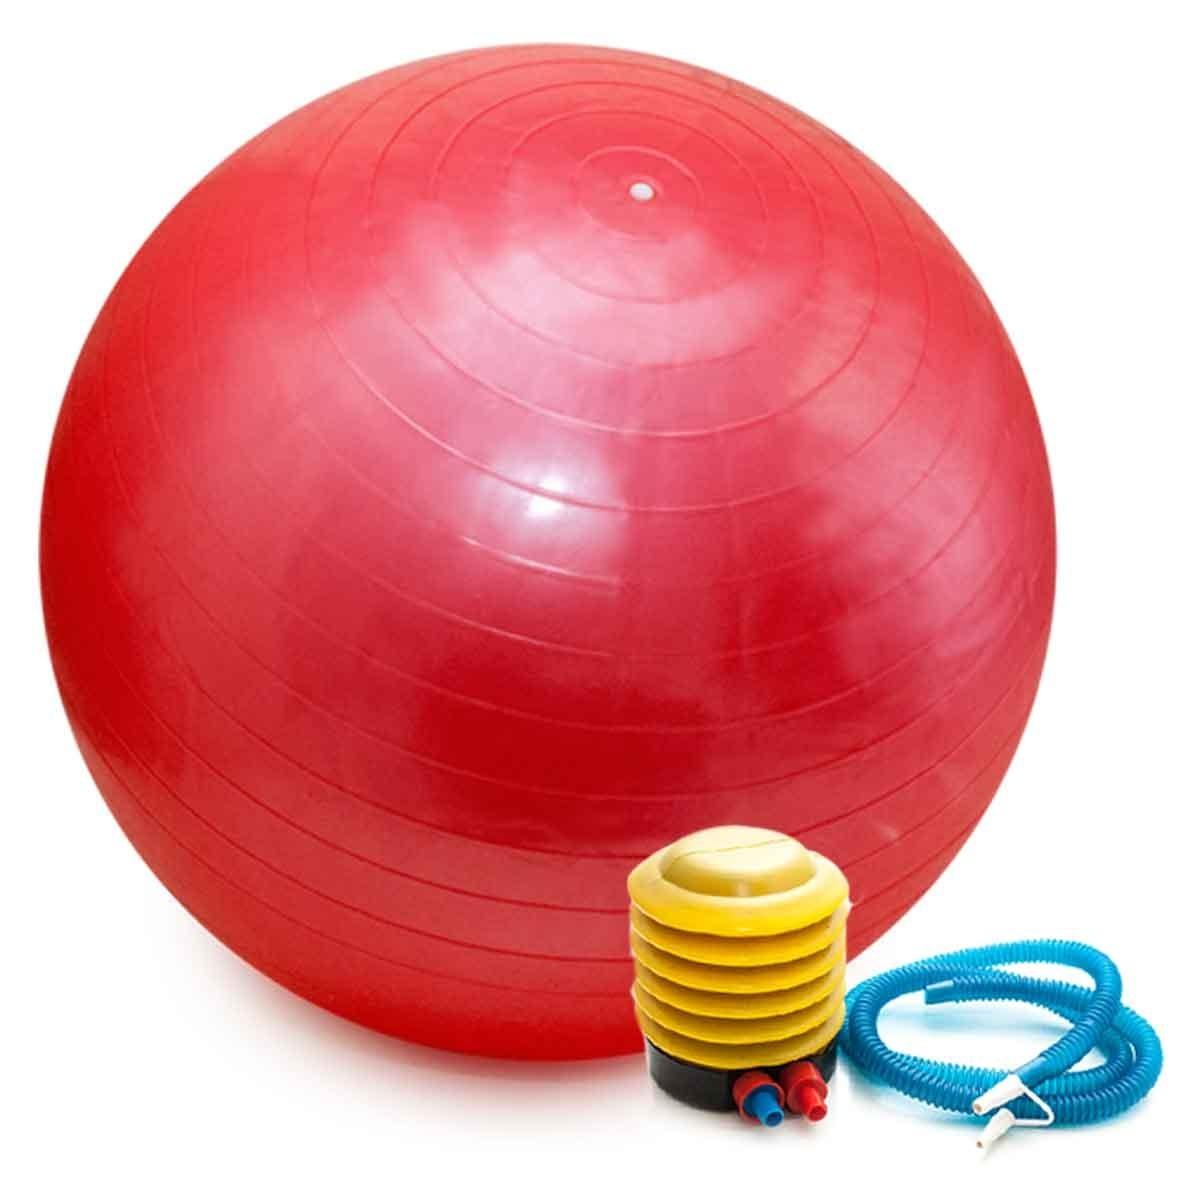 Bola Pilates Yoga Fitness 65 Cm C  Bomba Abdominal Ginástica - R  37 ... 43dd87ce868df